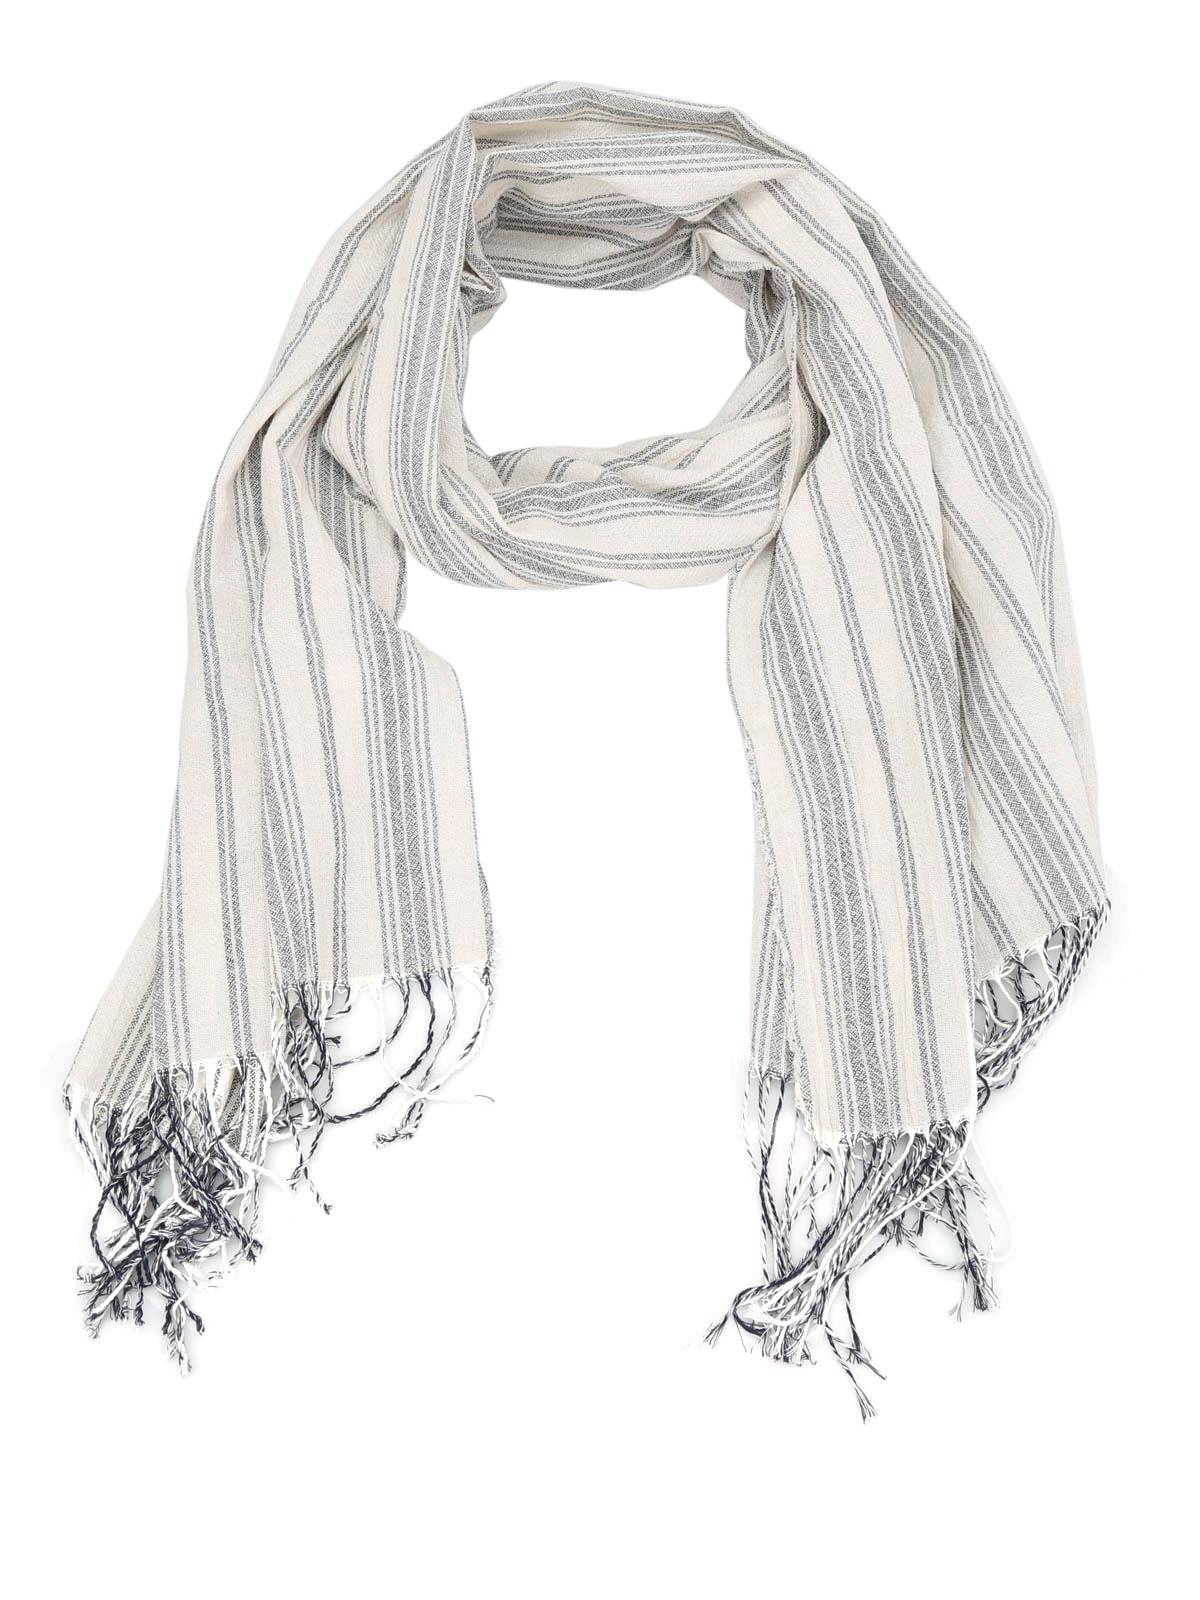 5c411e1ae8 Dondup - Sciarpa in tela di cotone - sciarpe e foulard - UK067 Y331X 102